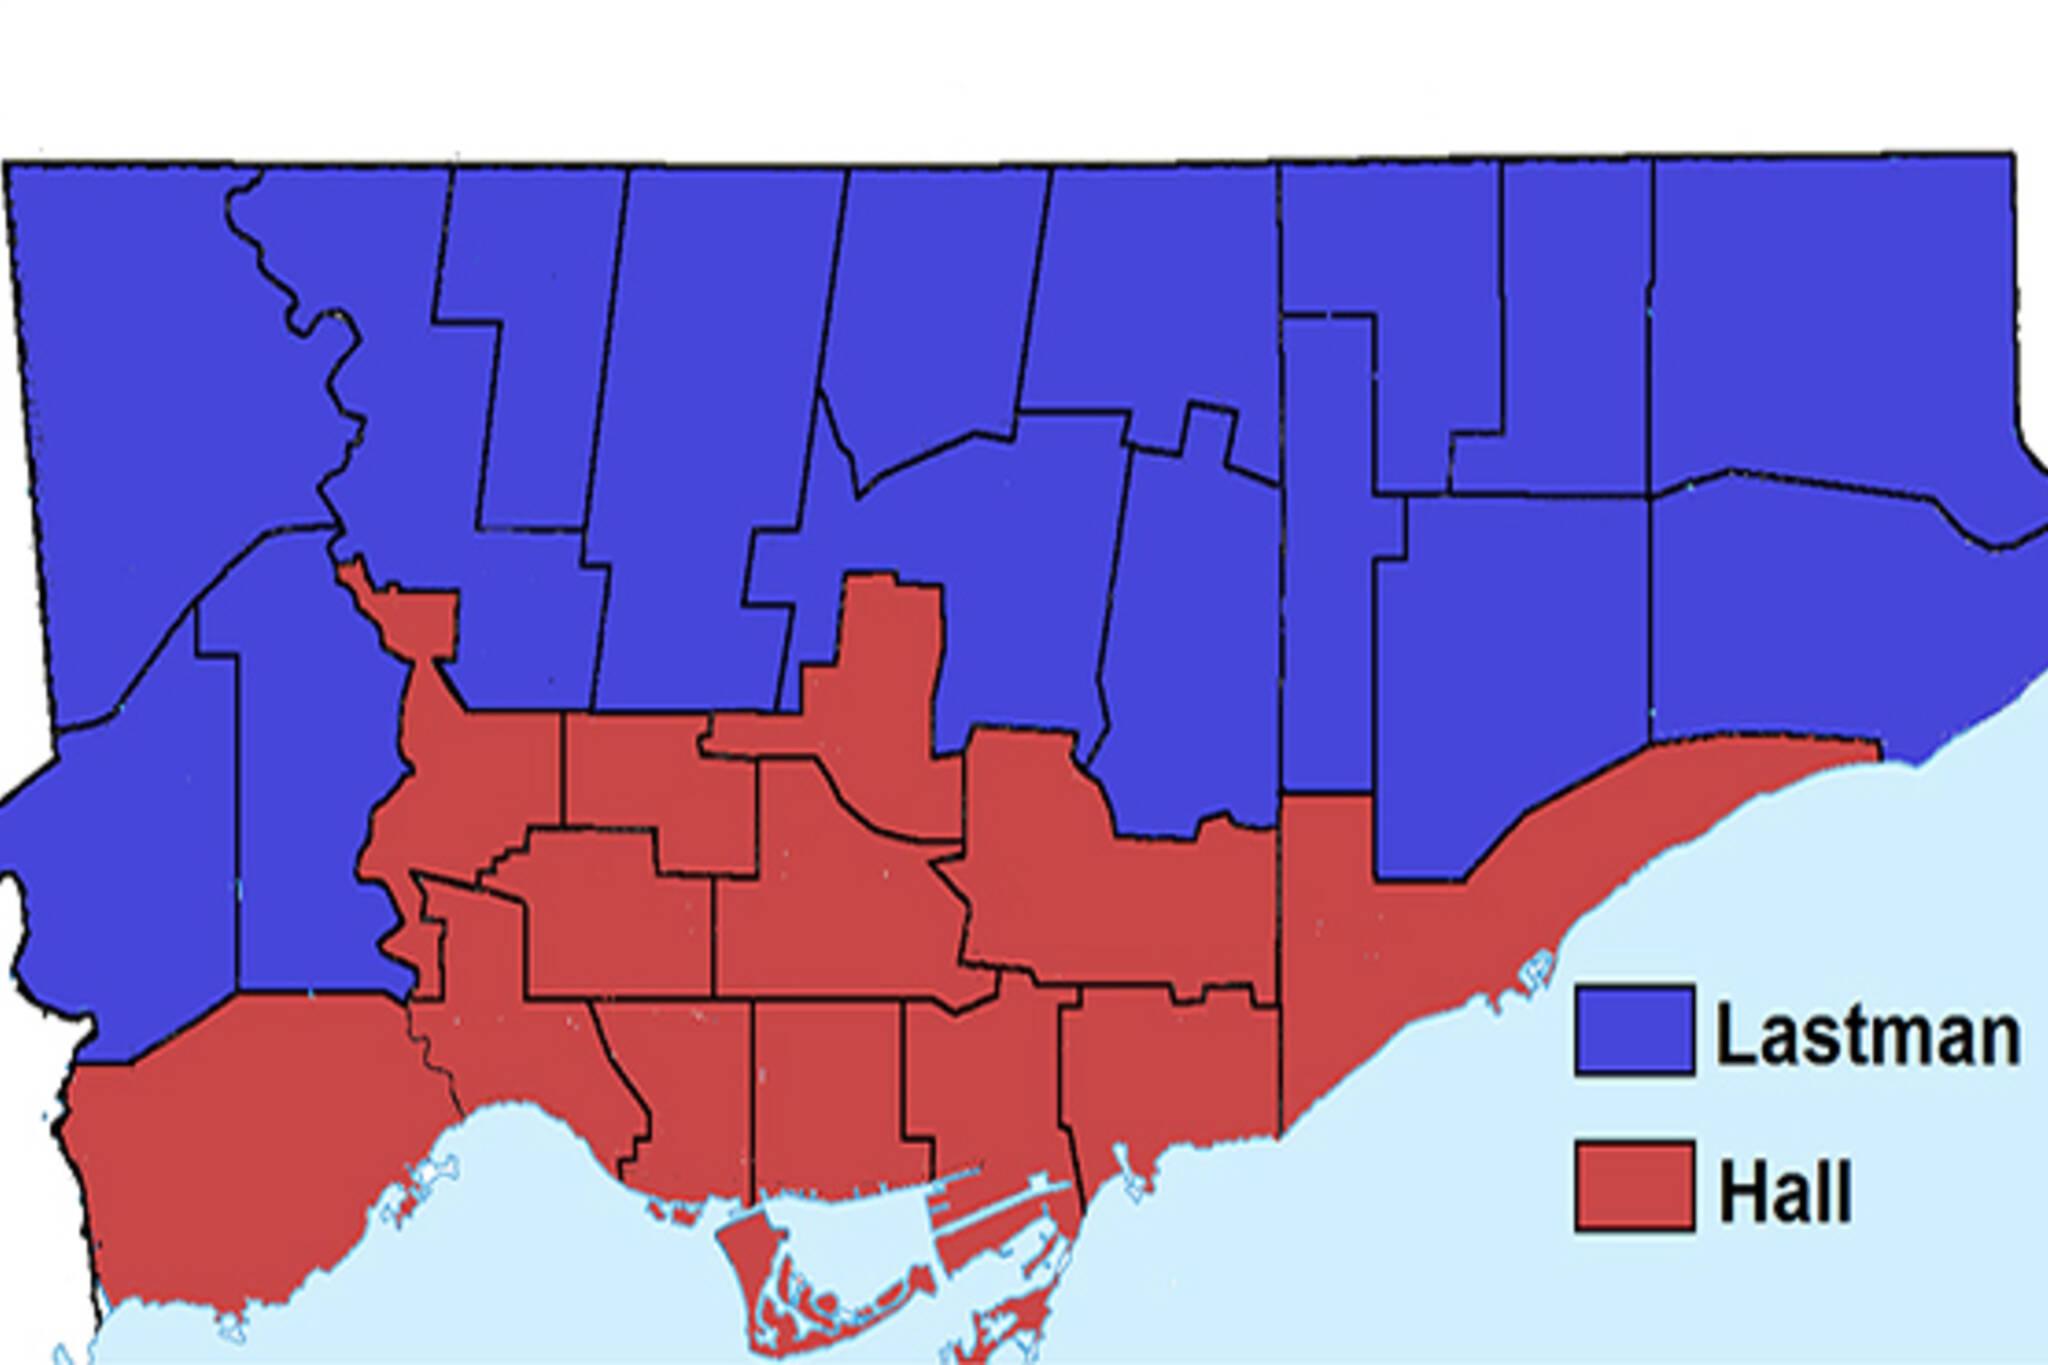 Toronto election results 1997